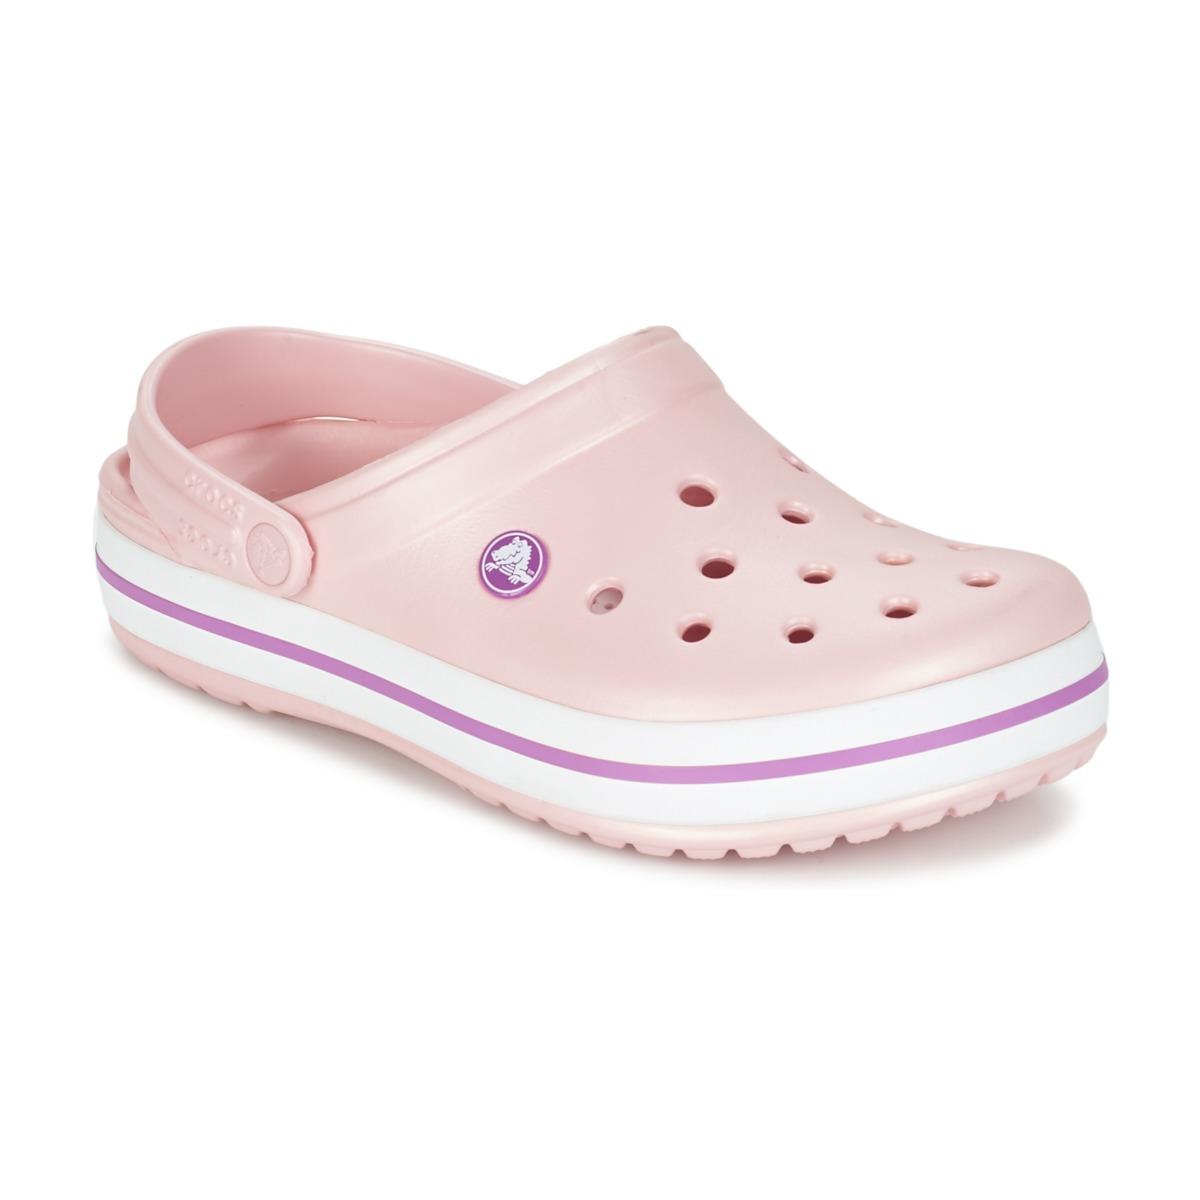 b53eb53c0e78 Crocs CROCBAND PINK Wild Orchid Shoes Mules Women new ...